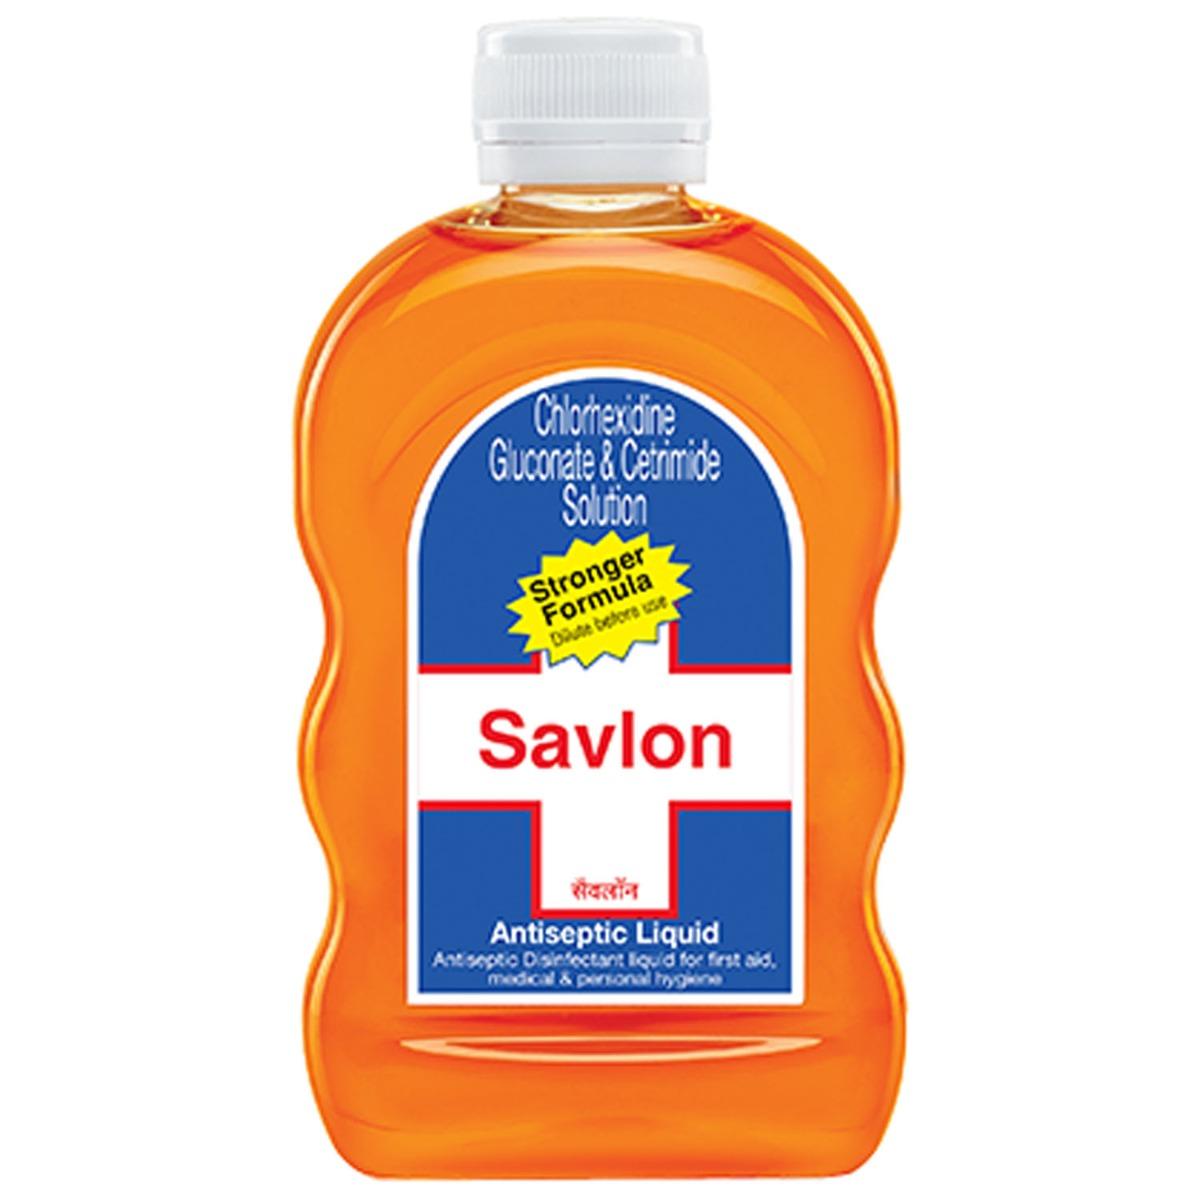 Savlon Antiseptic